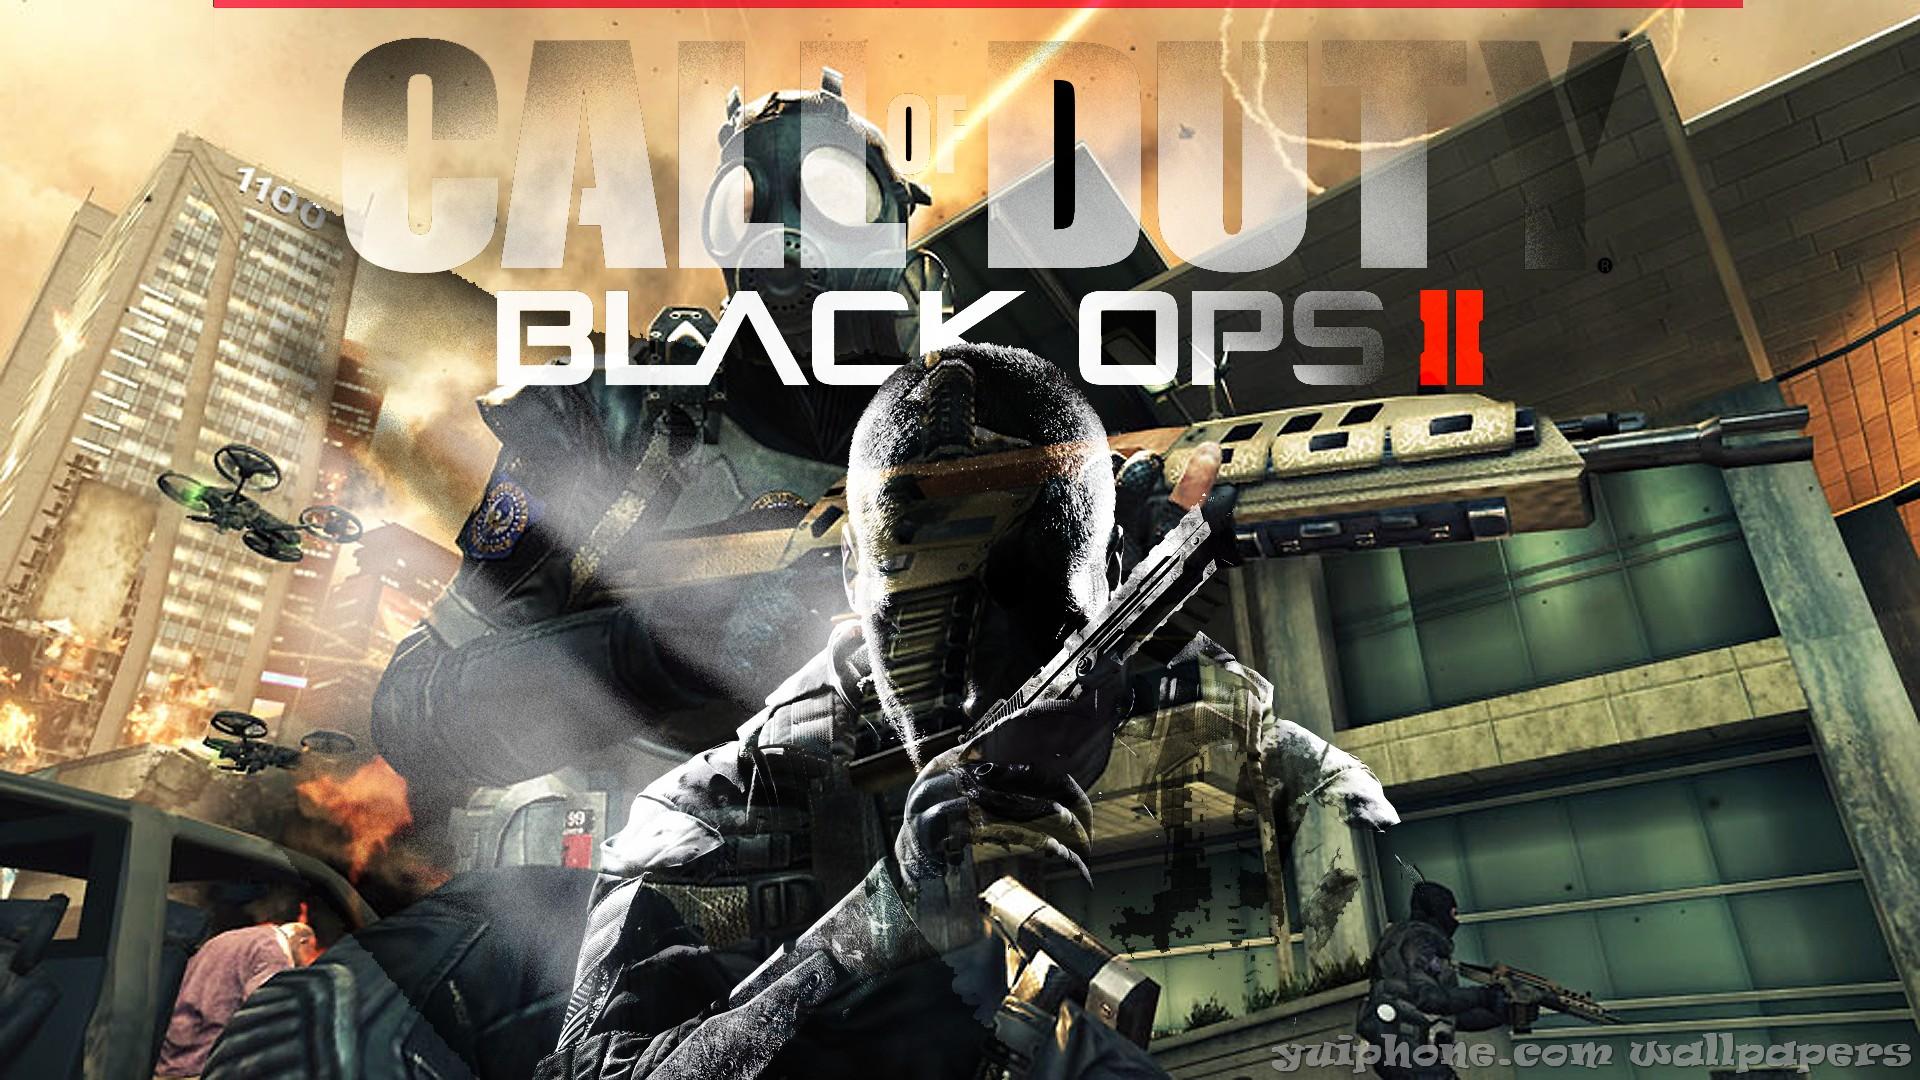 Call Duty: Black Ops II HD Images